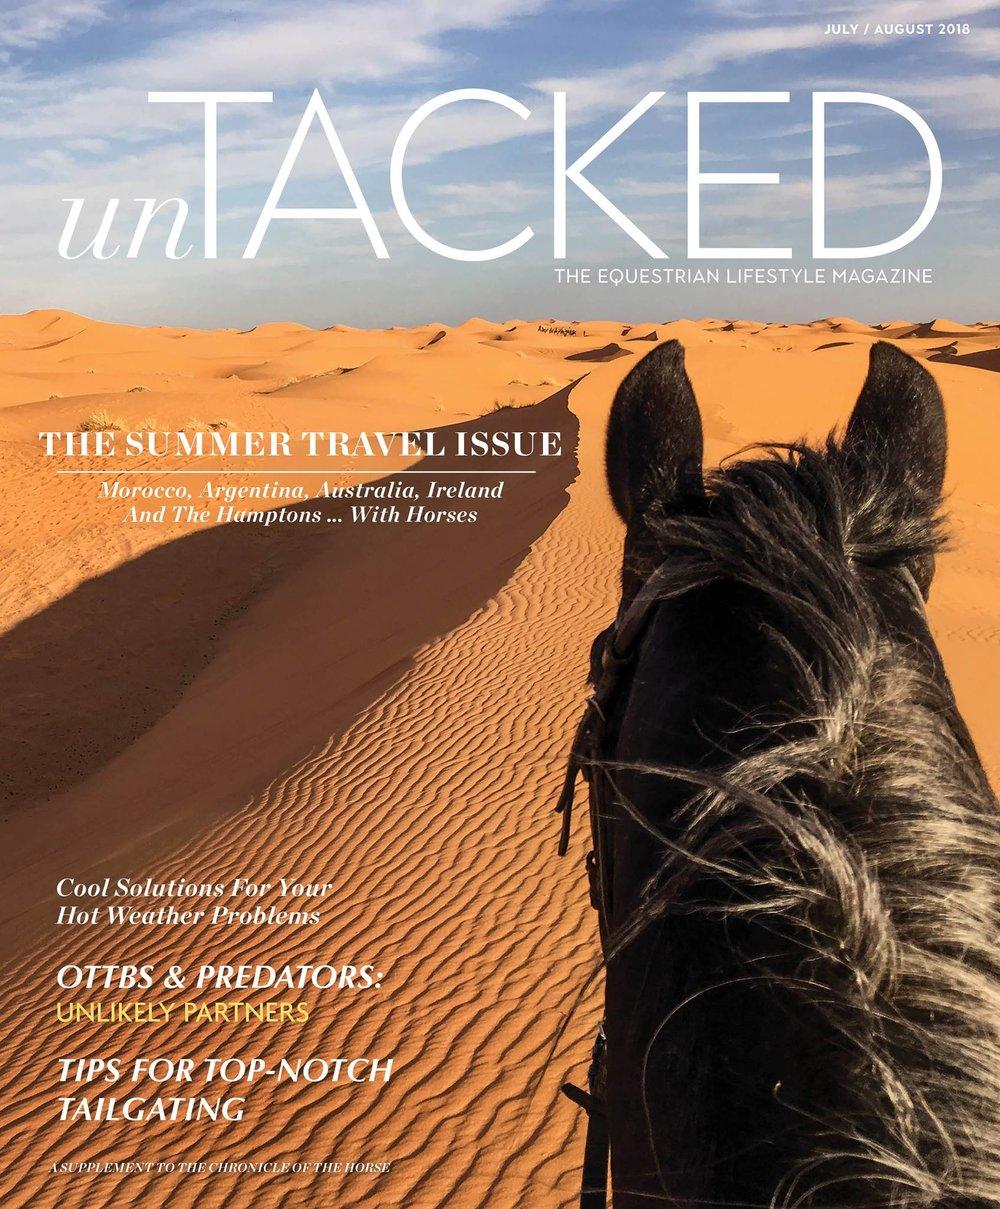 Untacked magazine (USA)